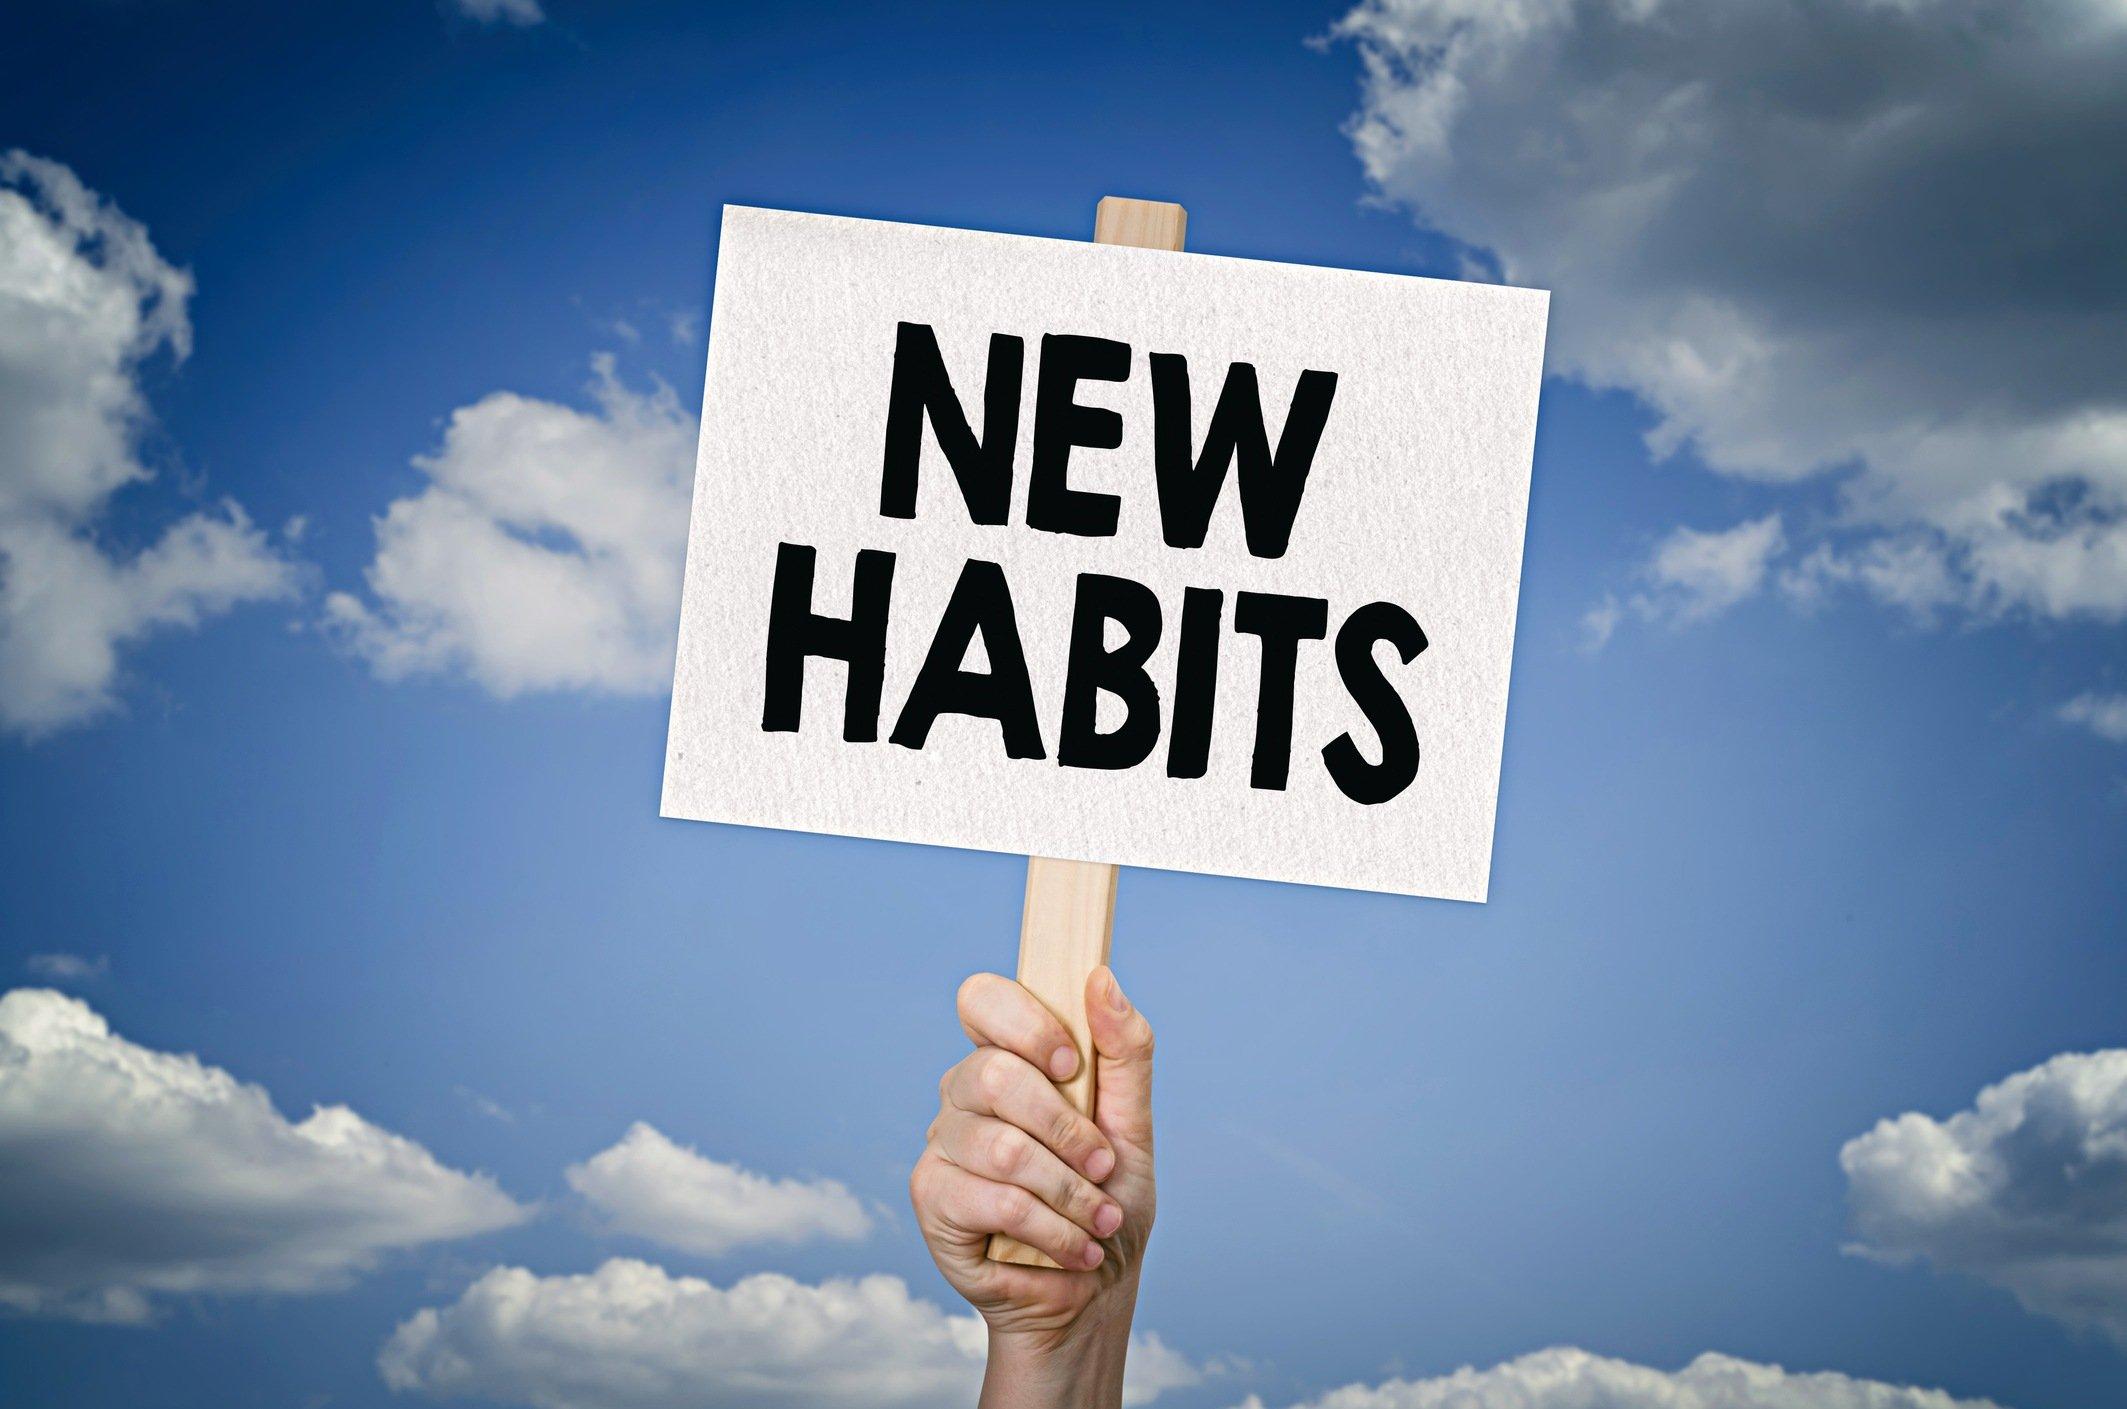 change your habits